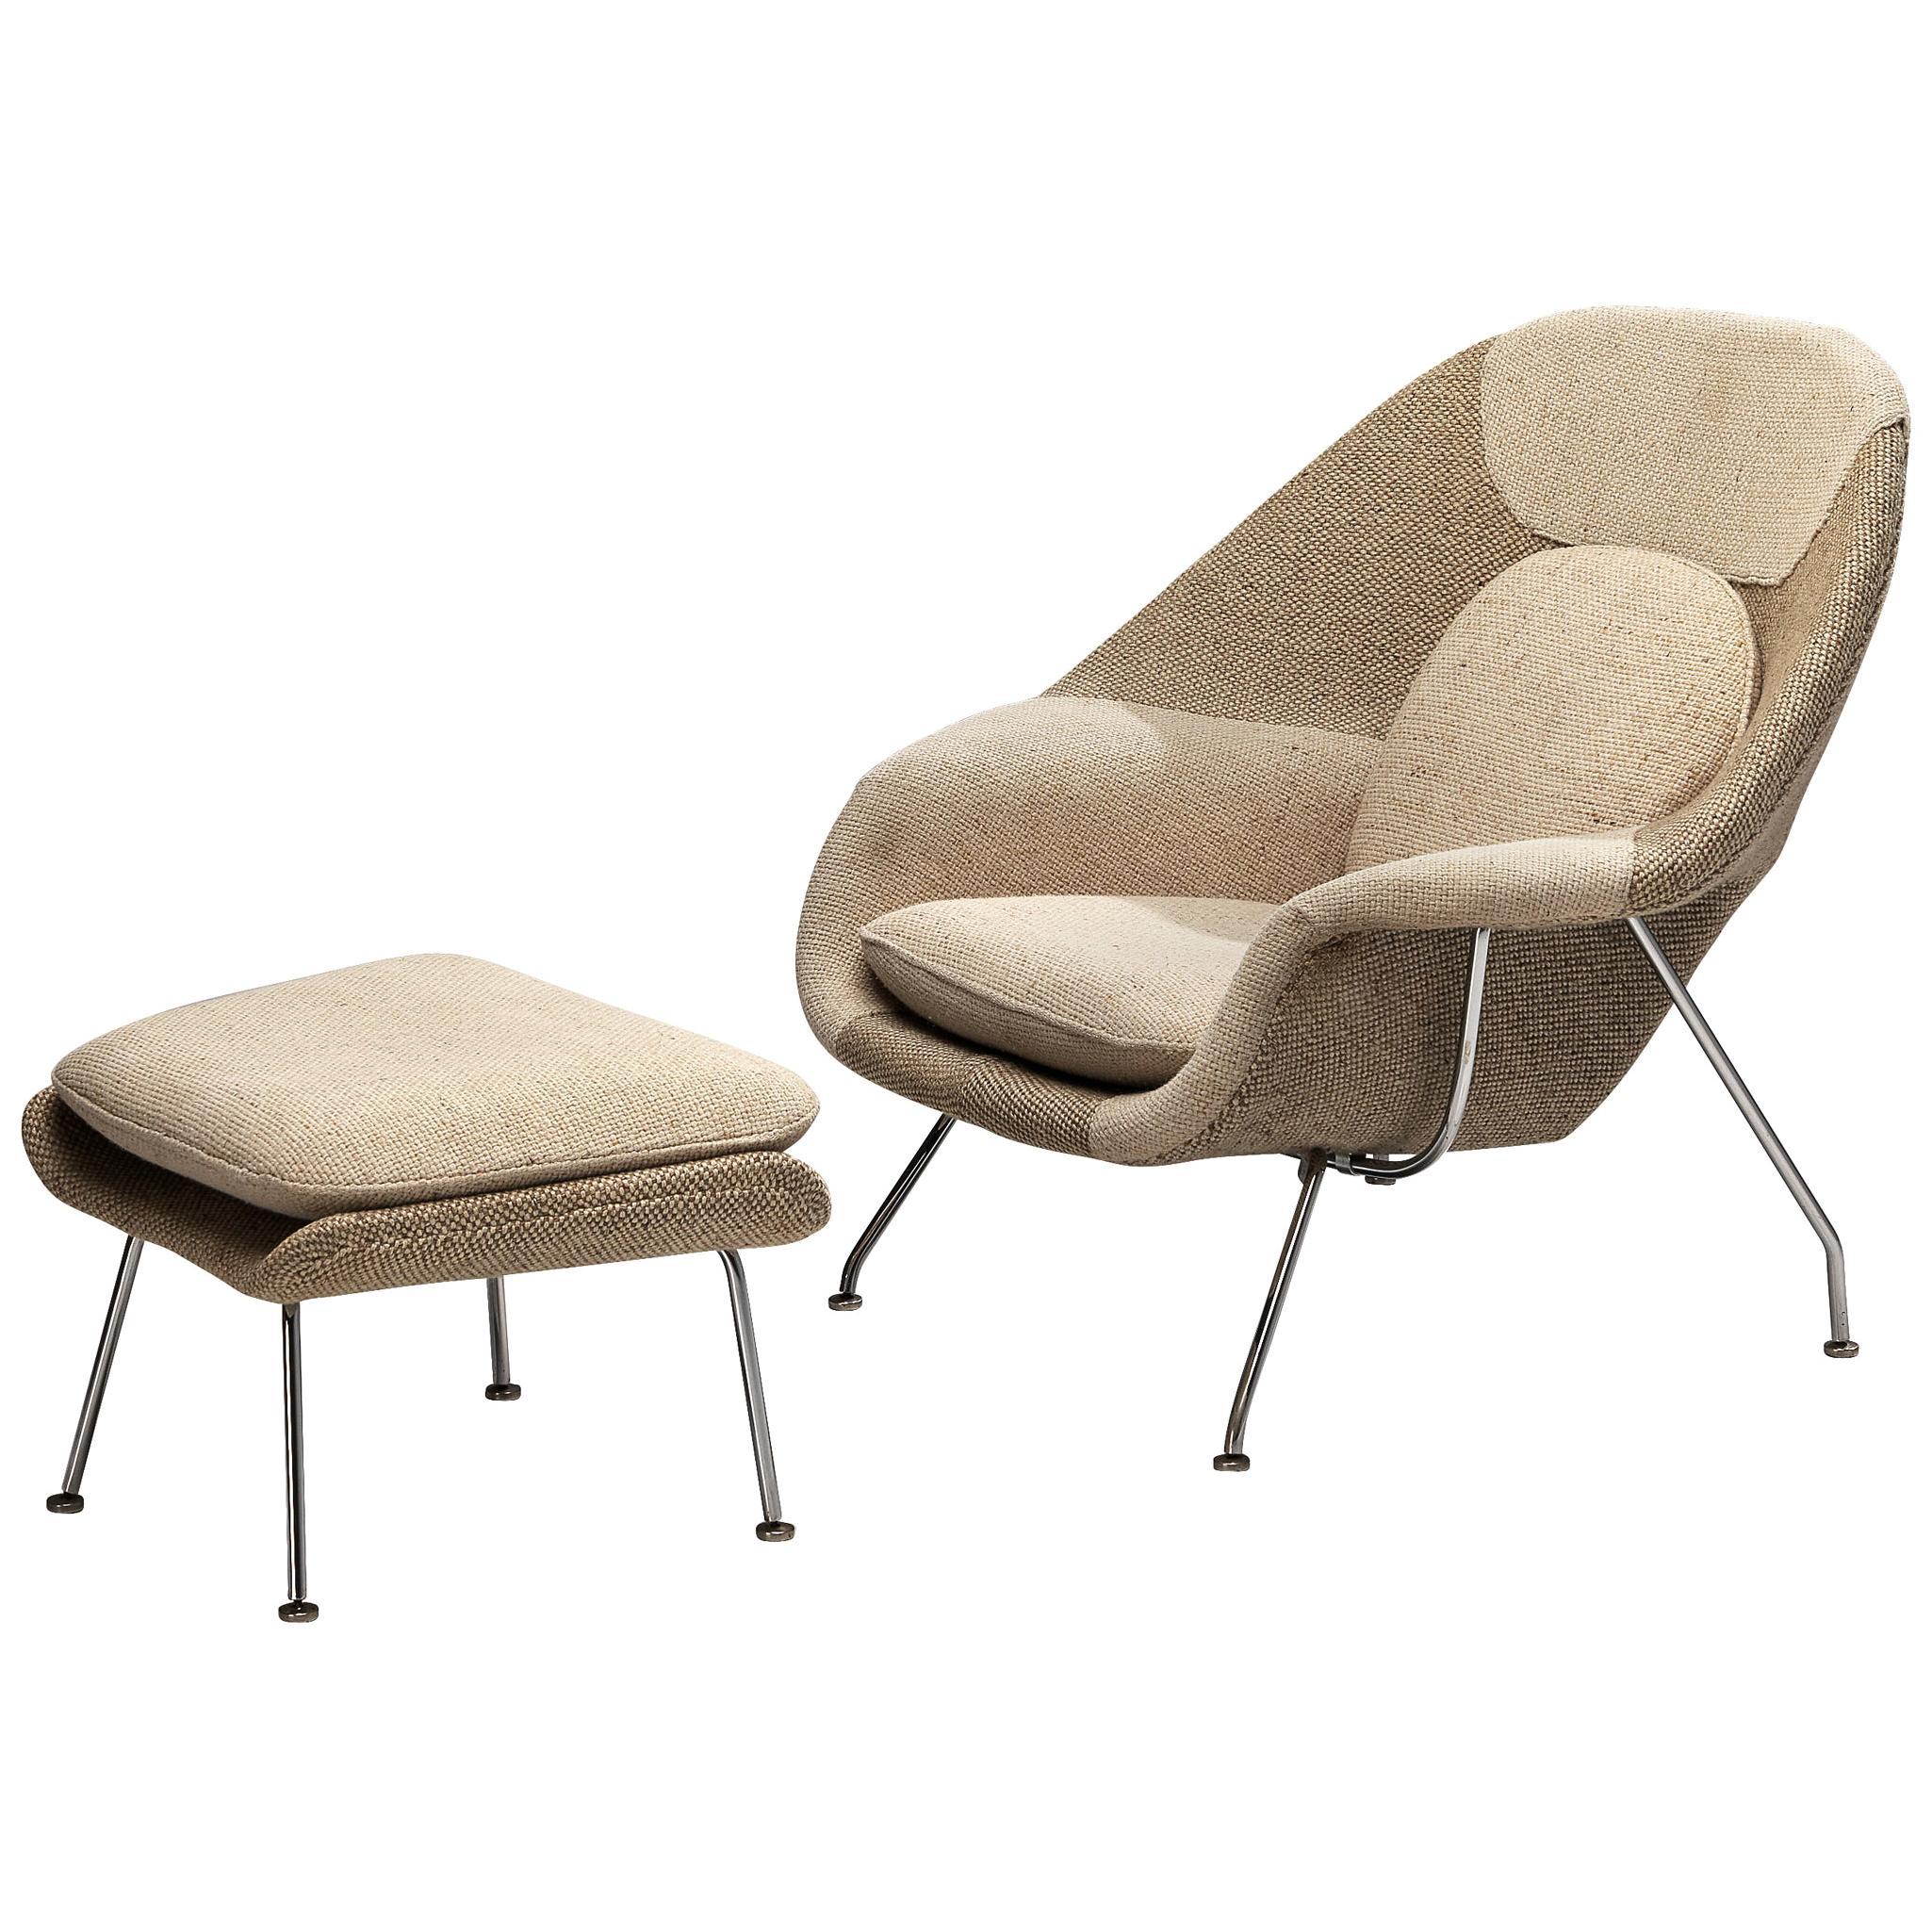 Eero Saarinen 'Womb' Chair with Ottoman in Original Off-White Fabric